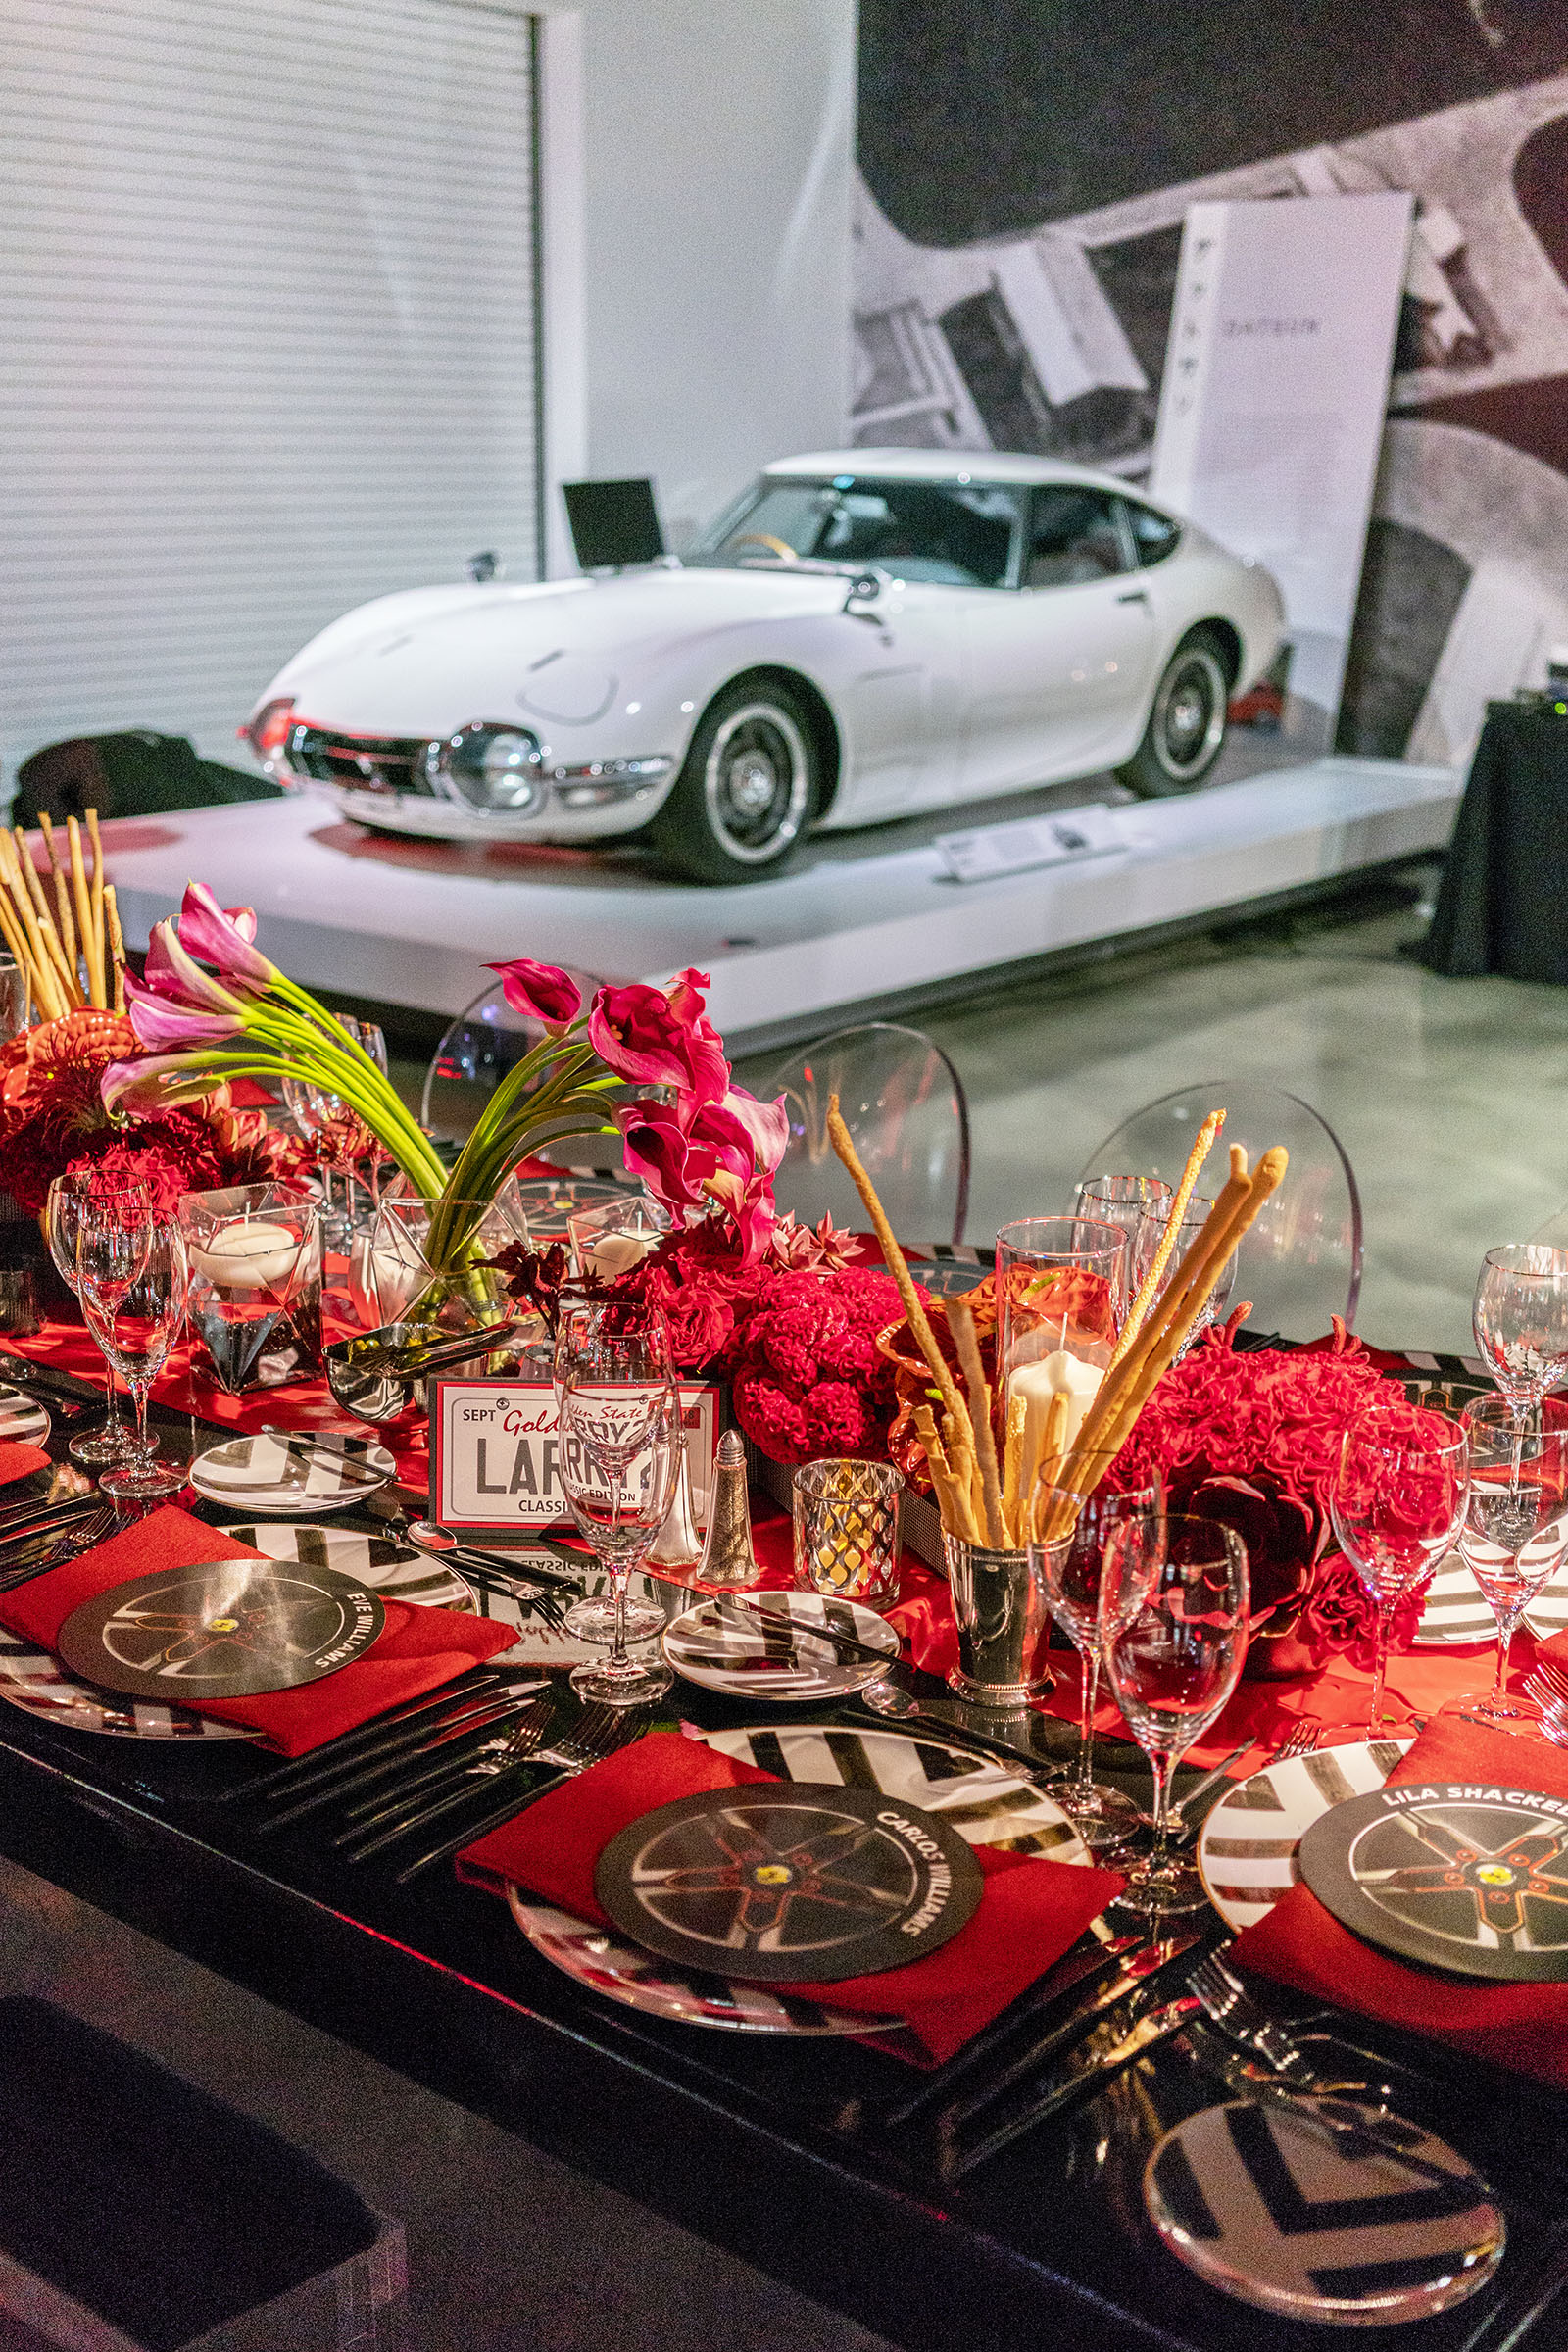 Petersen-Automotive-Museum-event-172749.jpg